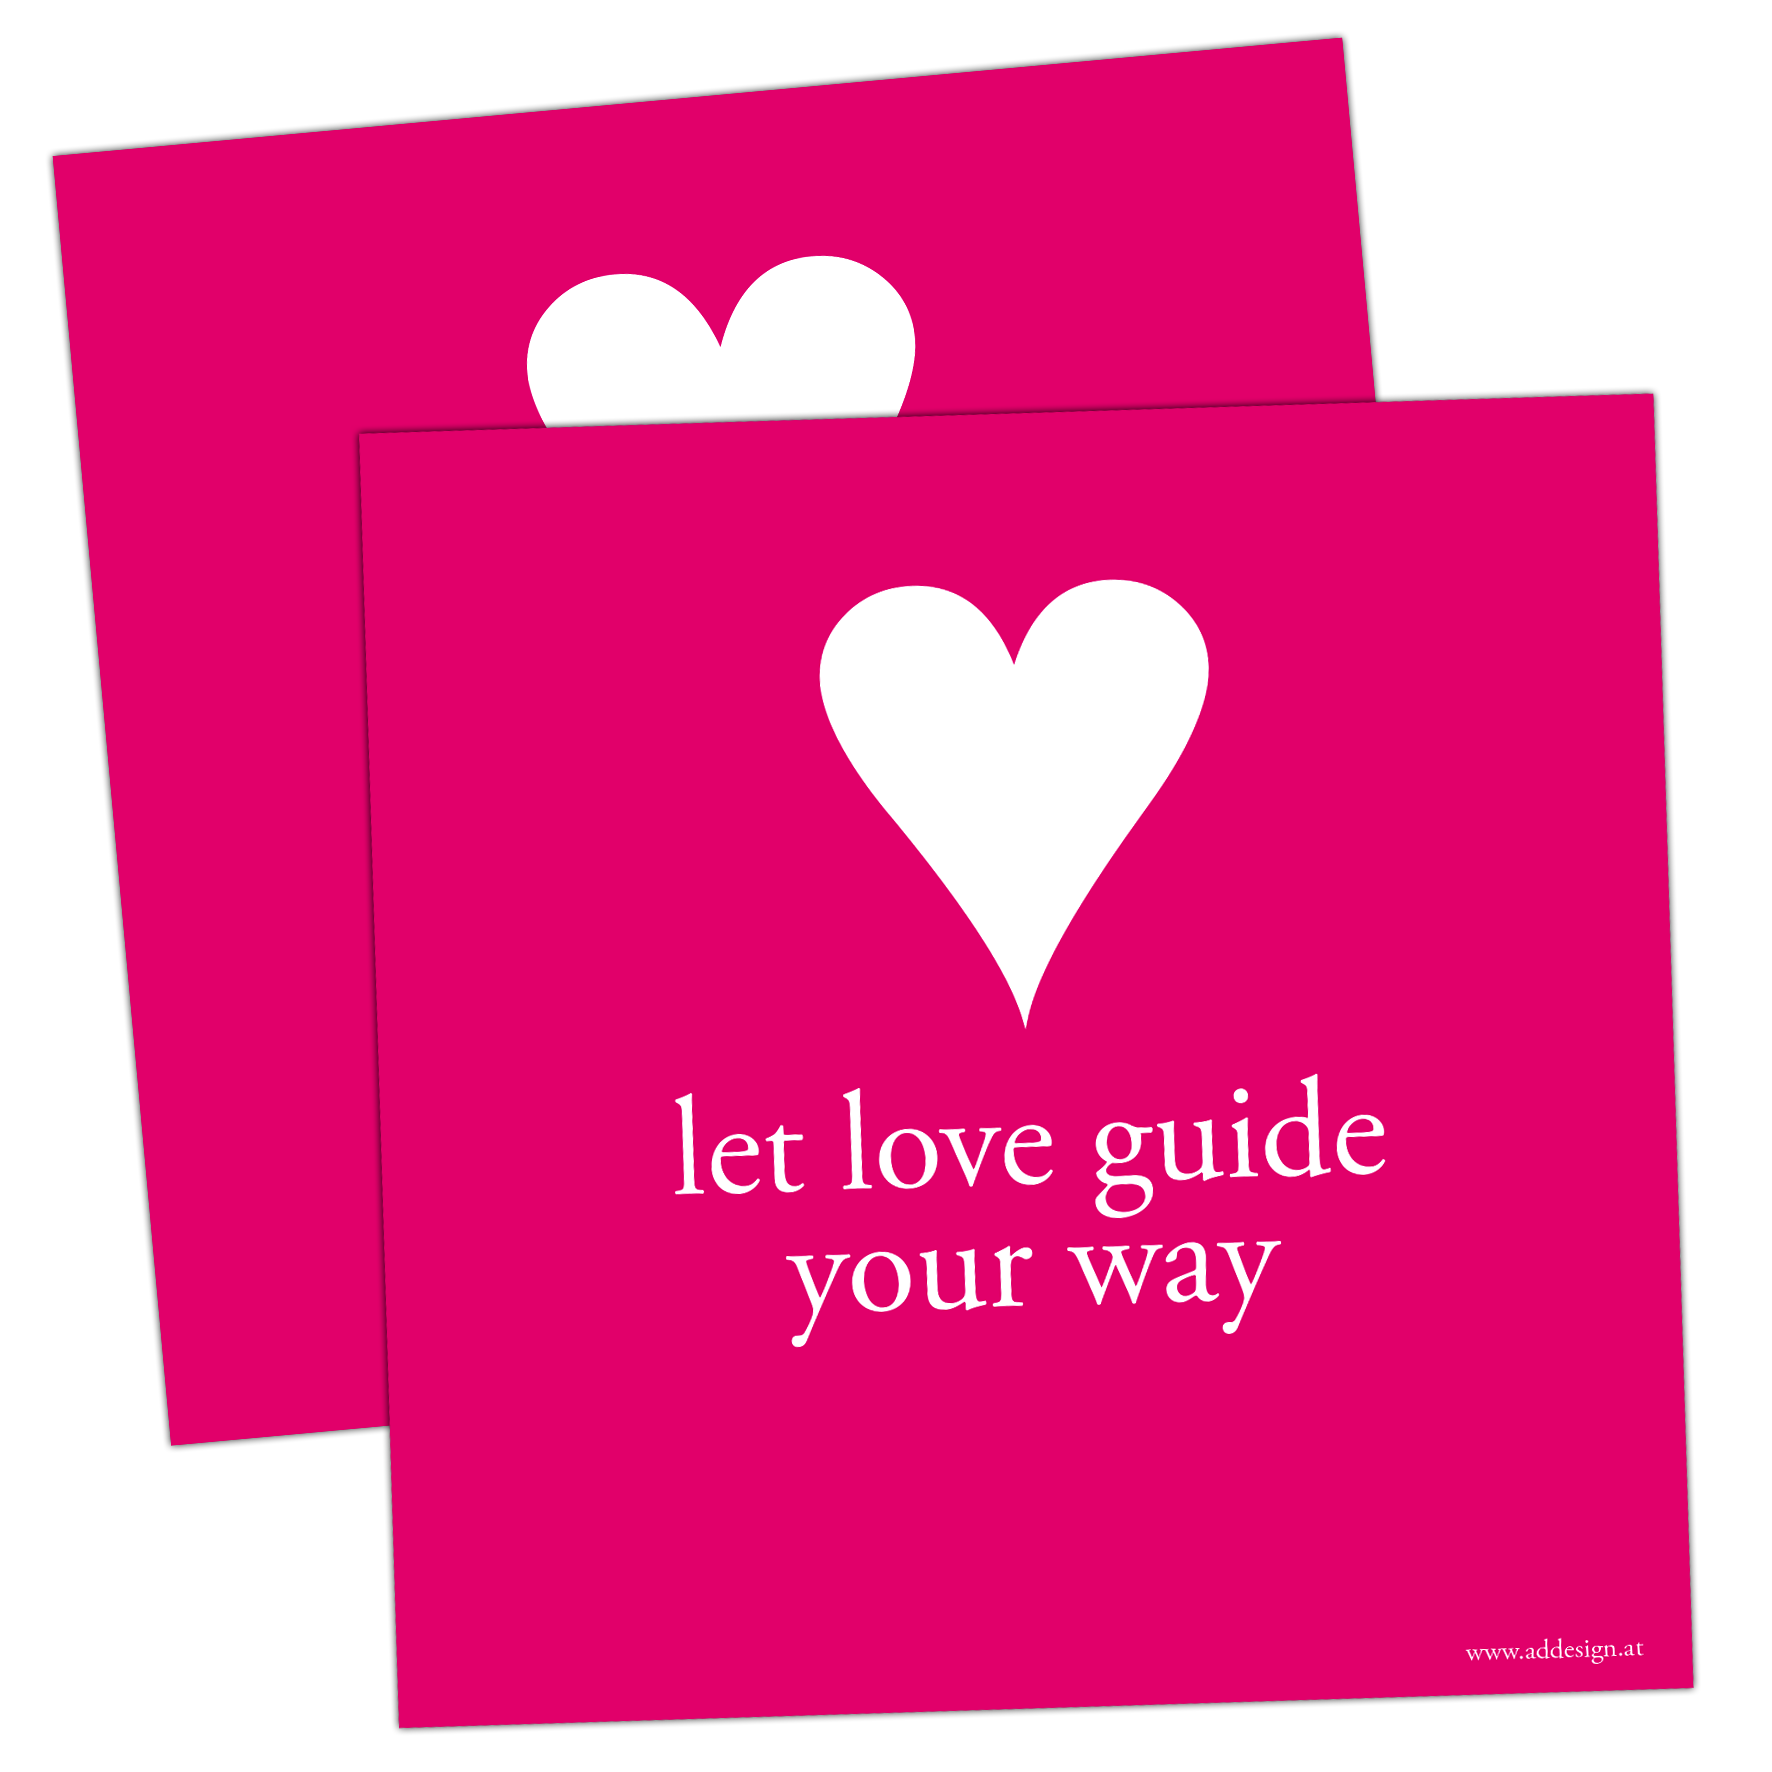 Addesign, Affirmationskarten, Gefühlskarten, Burnout, Let love guide your way